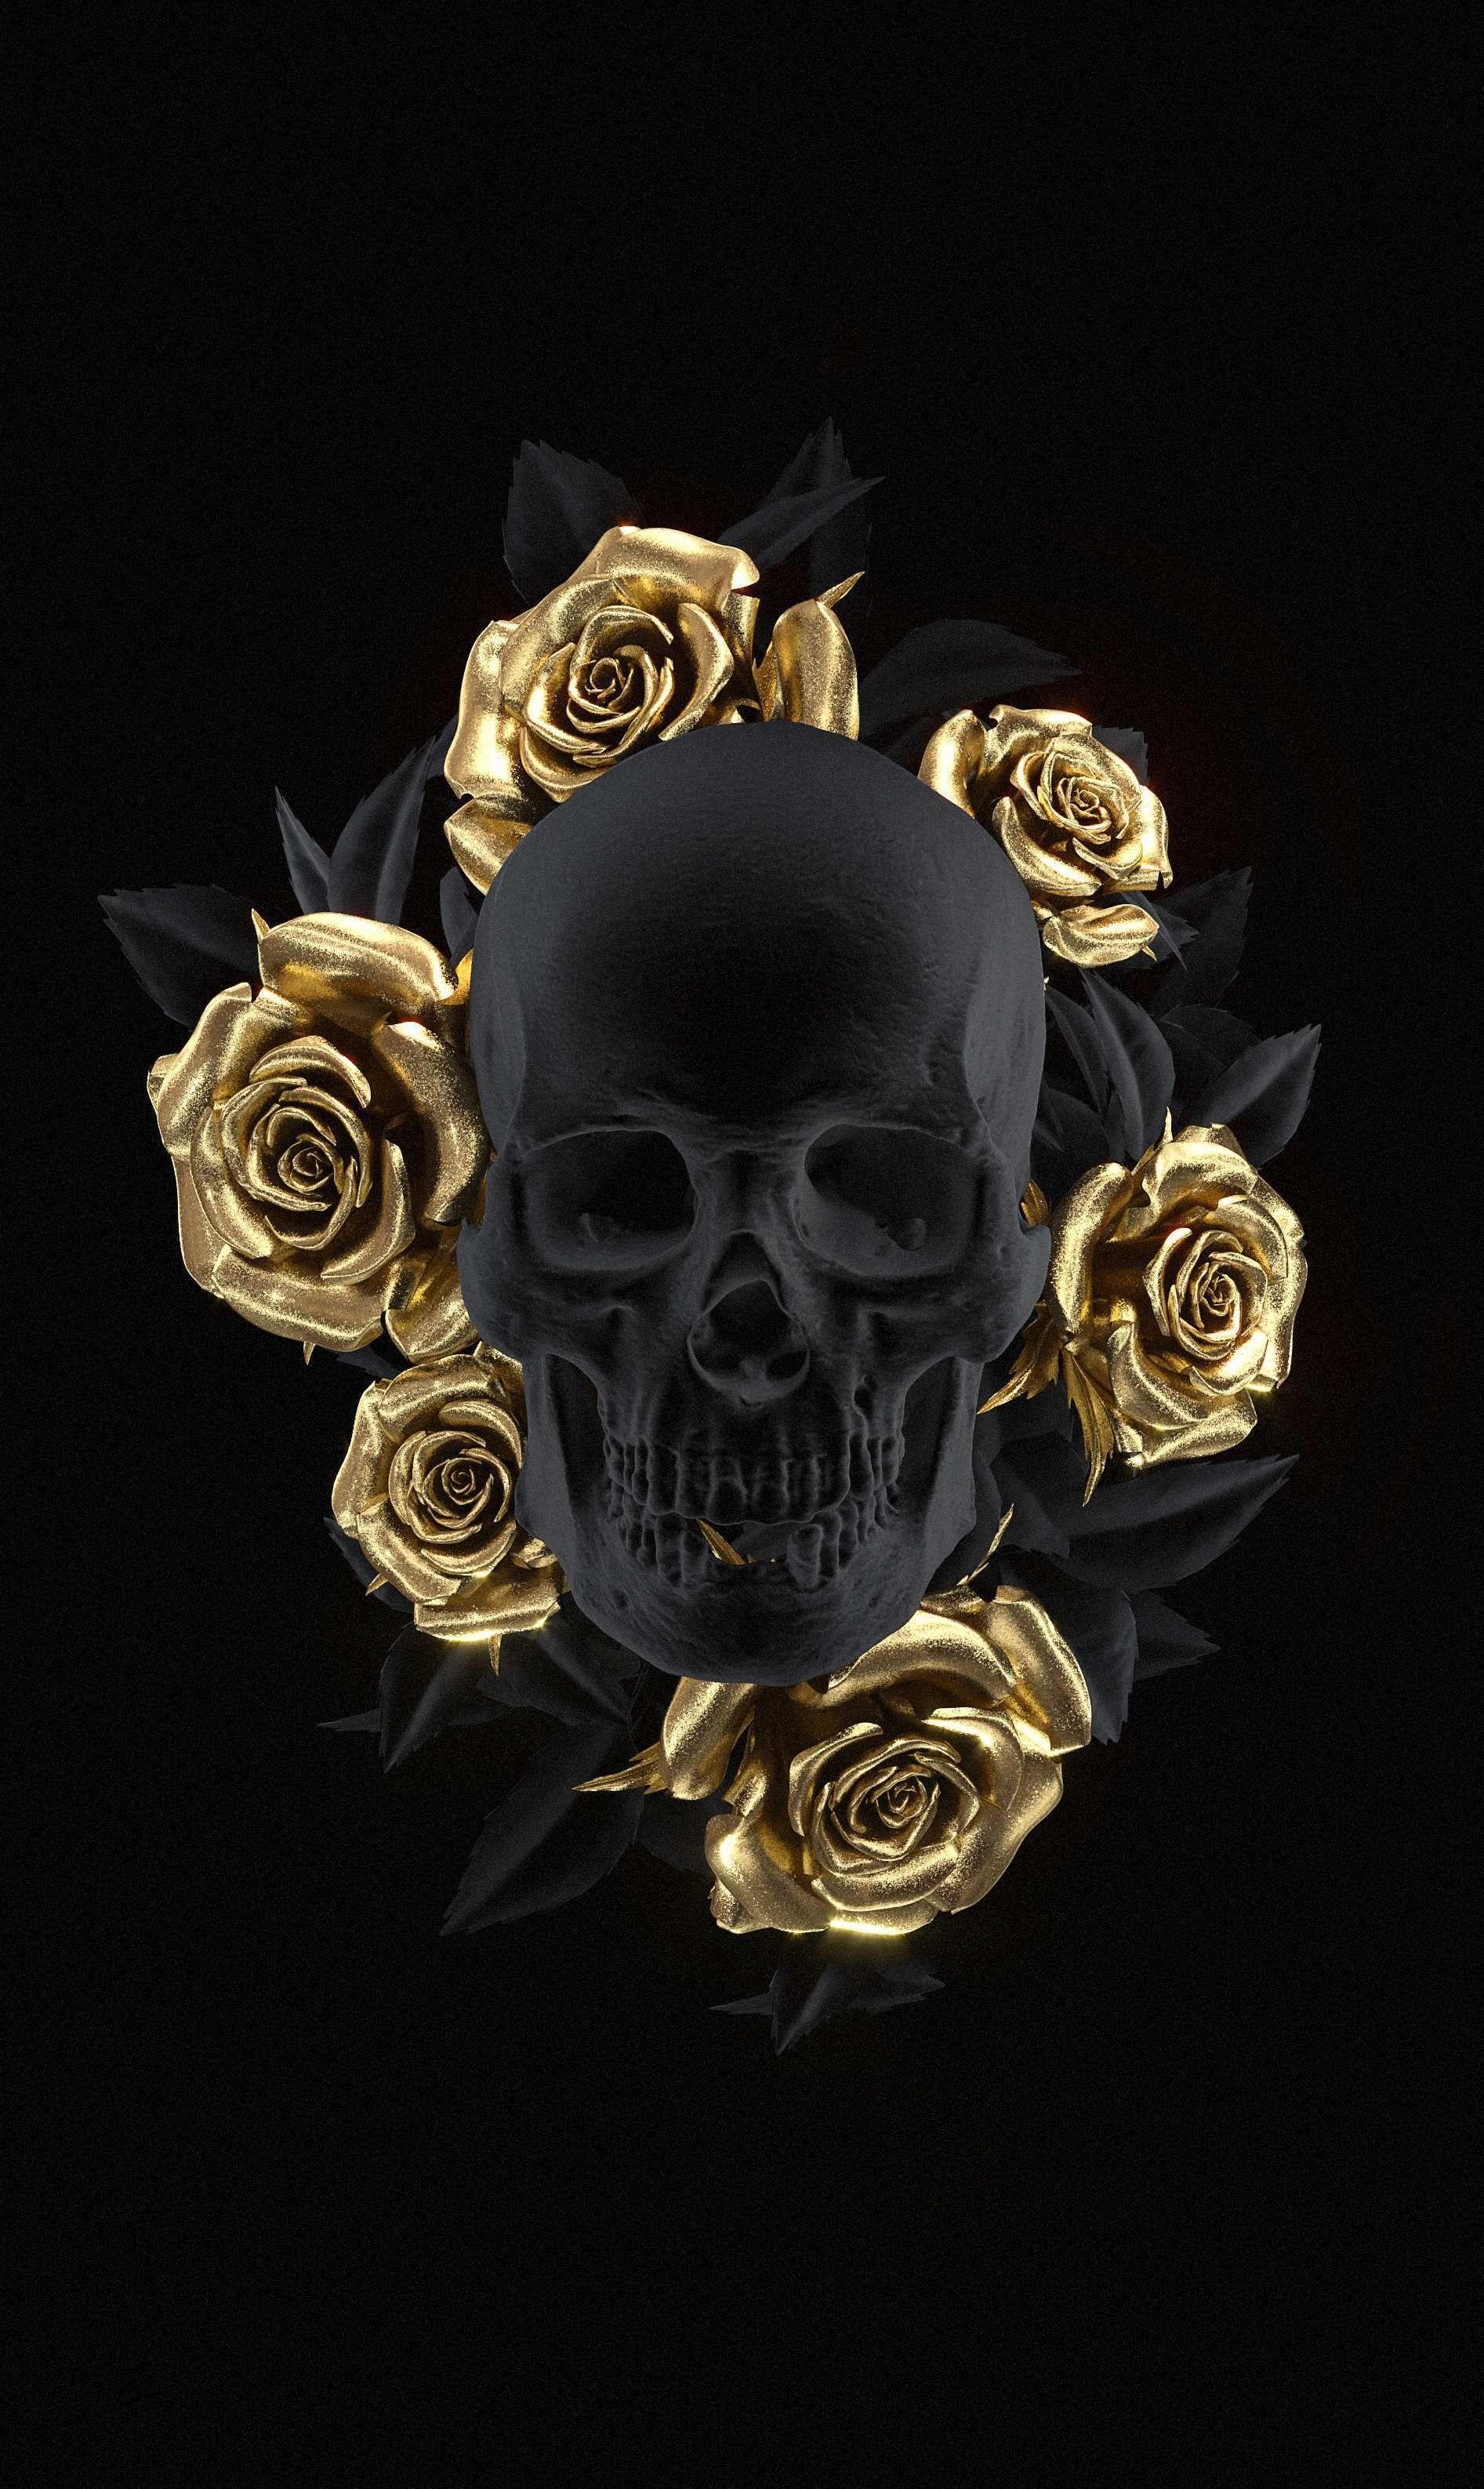 Happy Birthday Skull Images Awesome Skull Art by Uk Artist